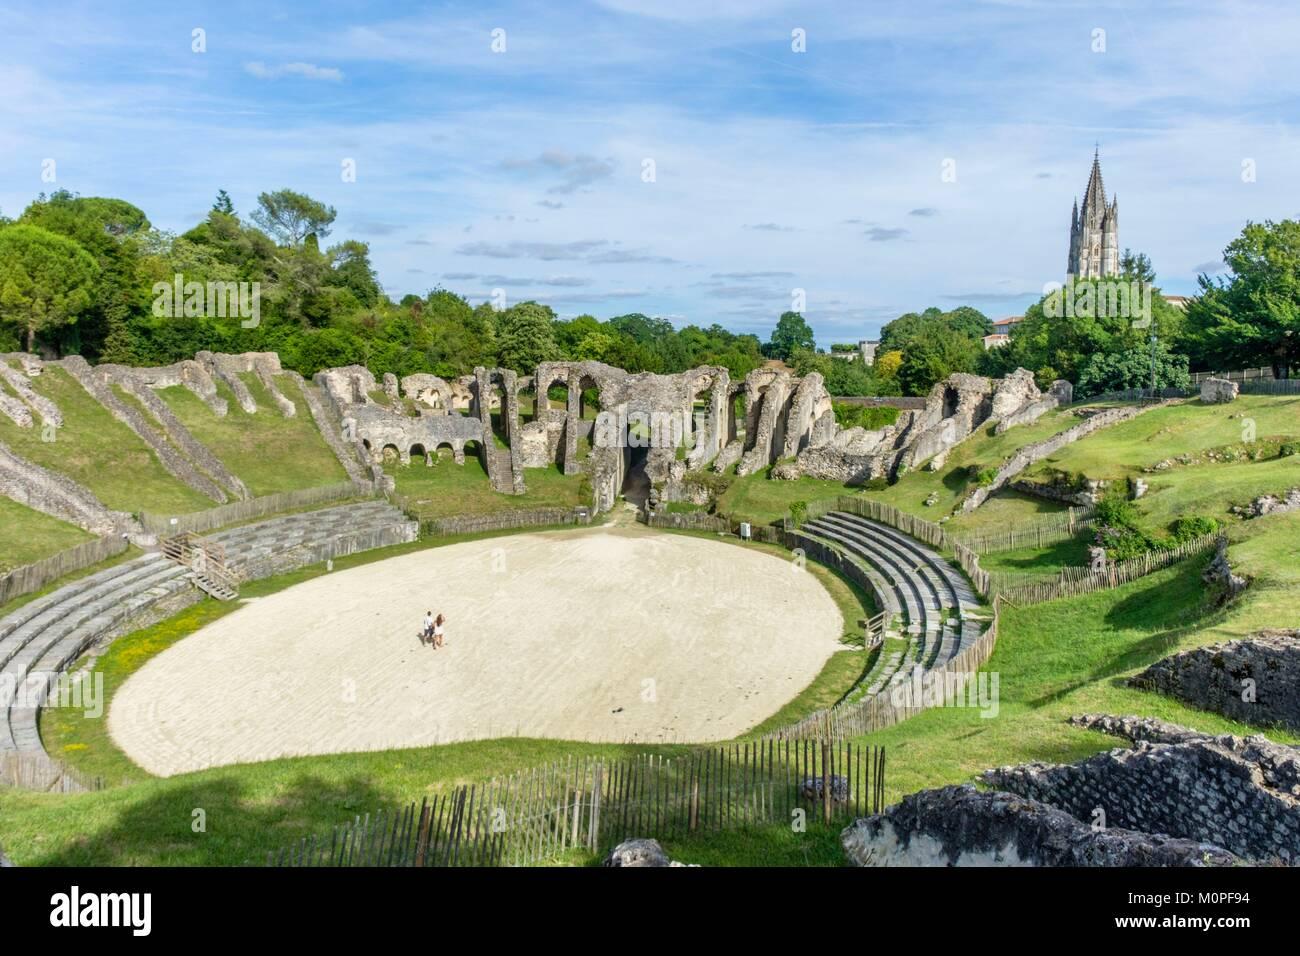 France,Charente Maritime,Saintonge,Saintes,the roman Amphitheatre built around 40 AD with a capacity of 12 000 à - Stock Image